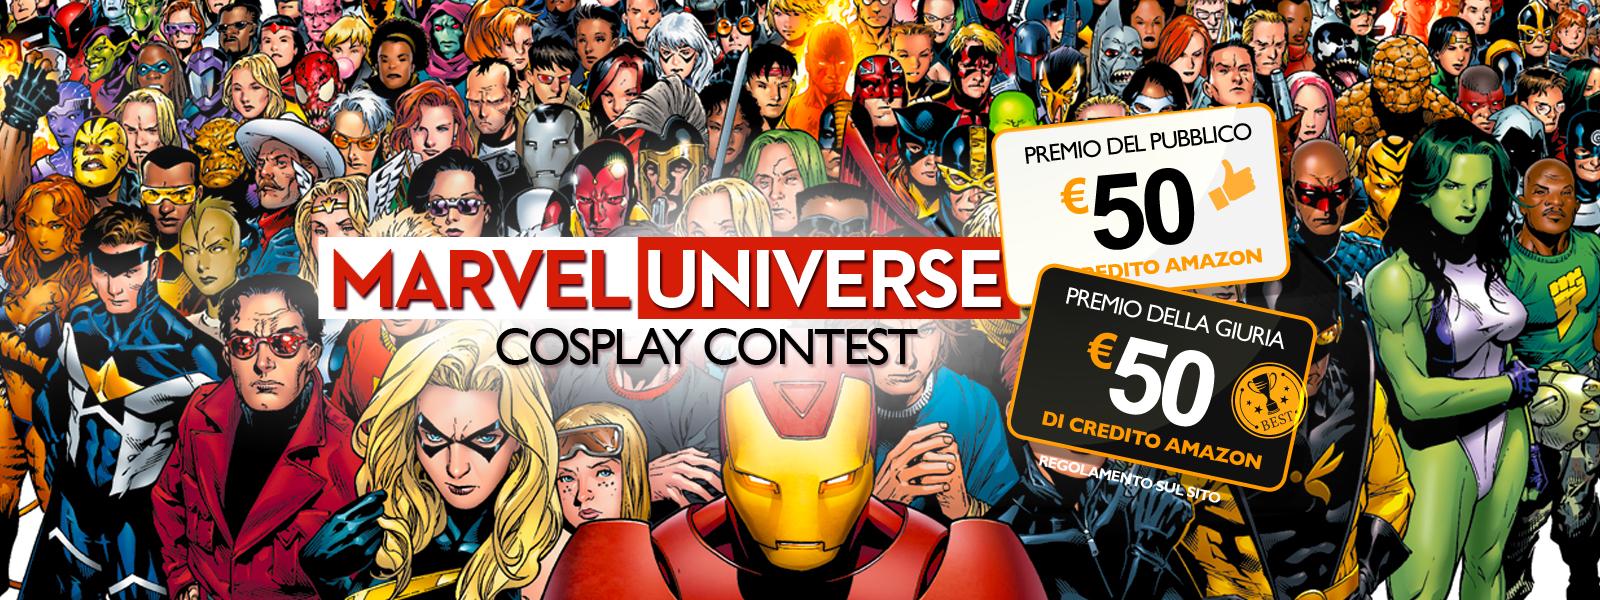 Marvel Universe Cosplay Contest: i vincitori